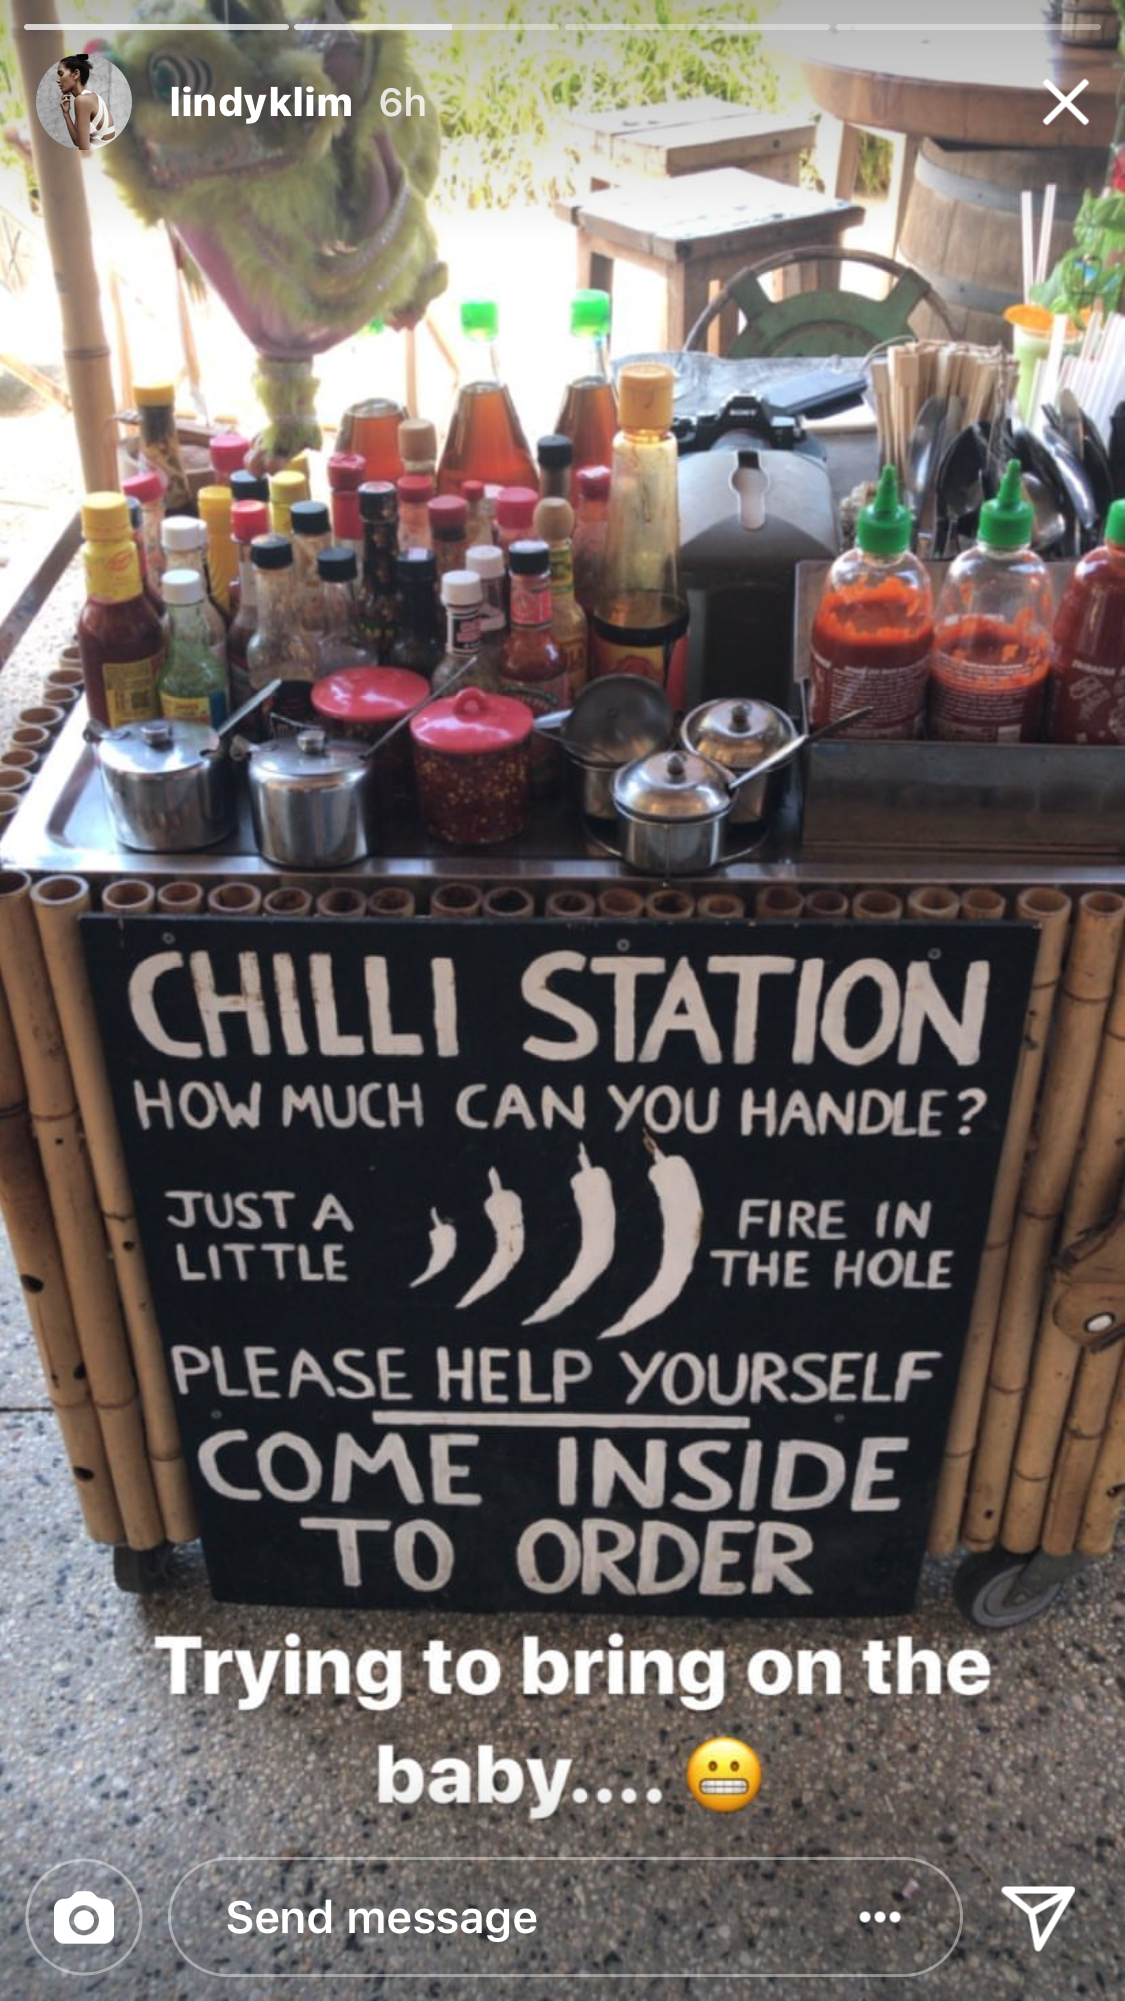 Lindy Klim at chilli station